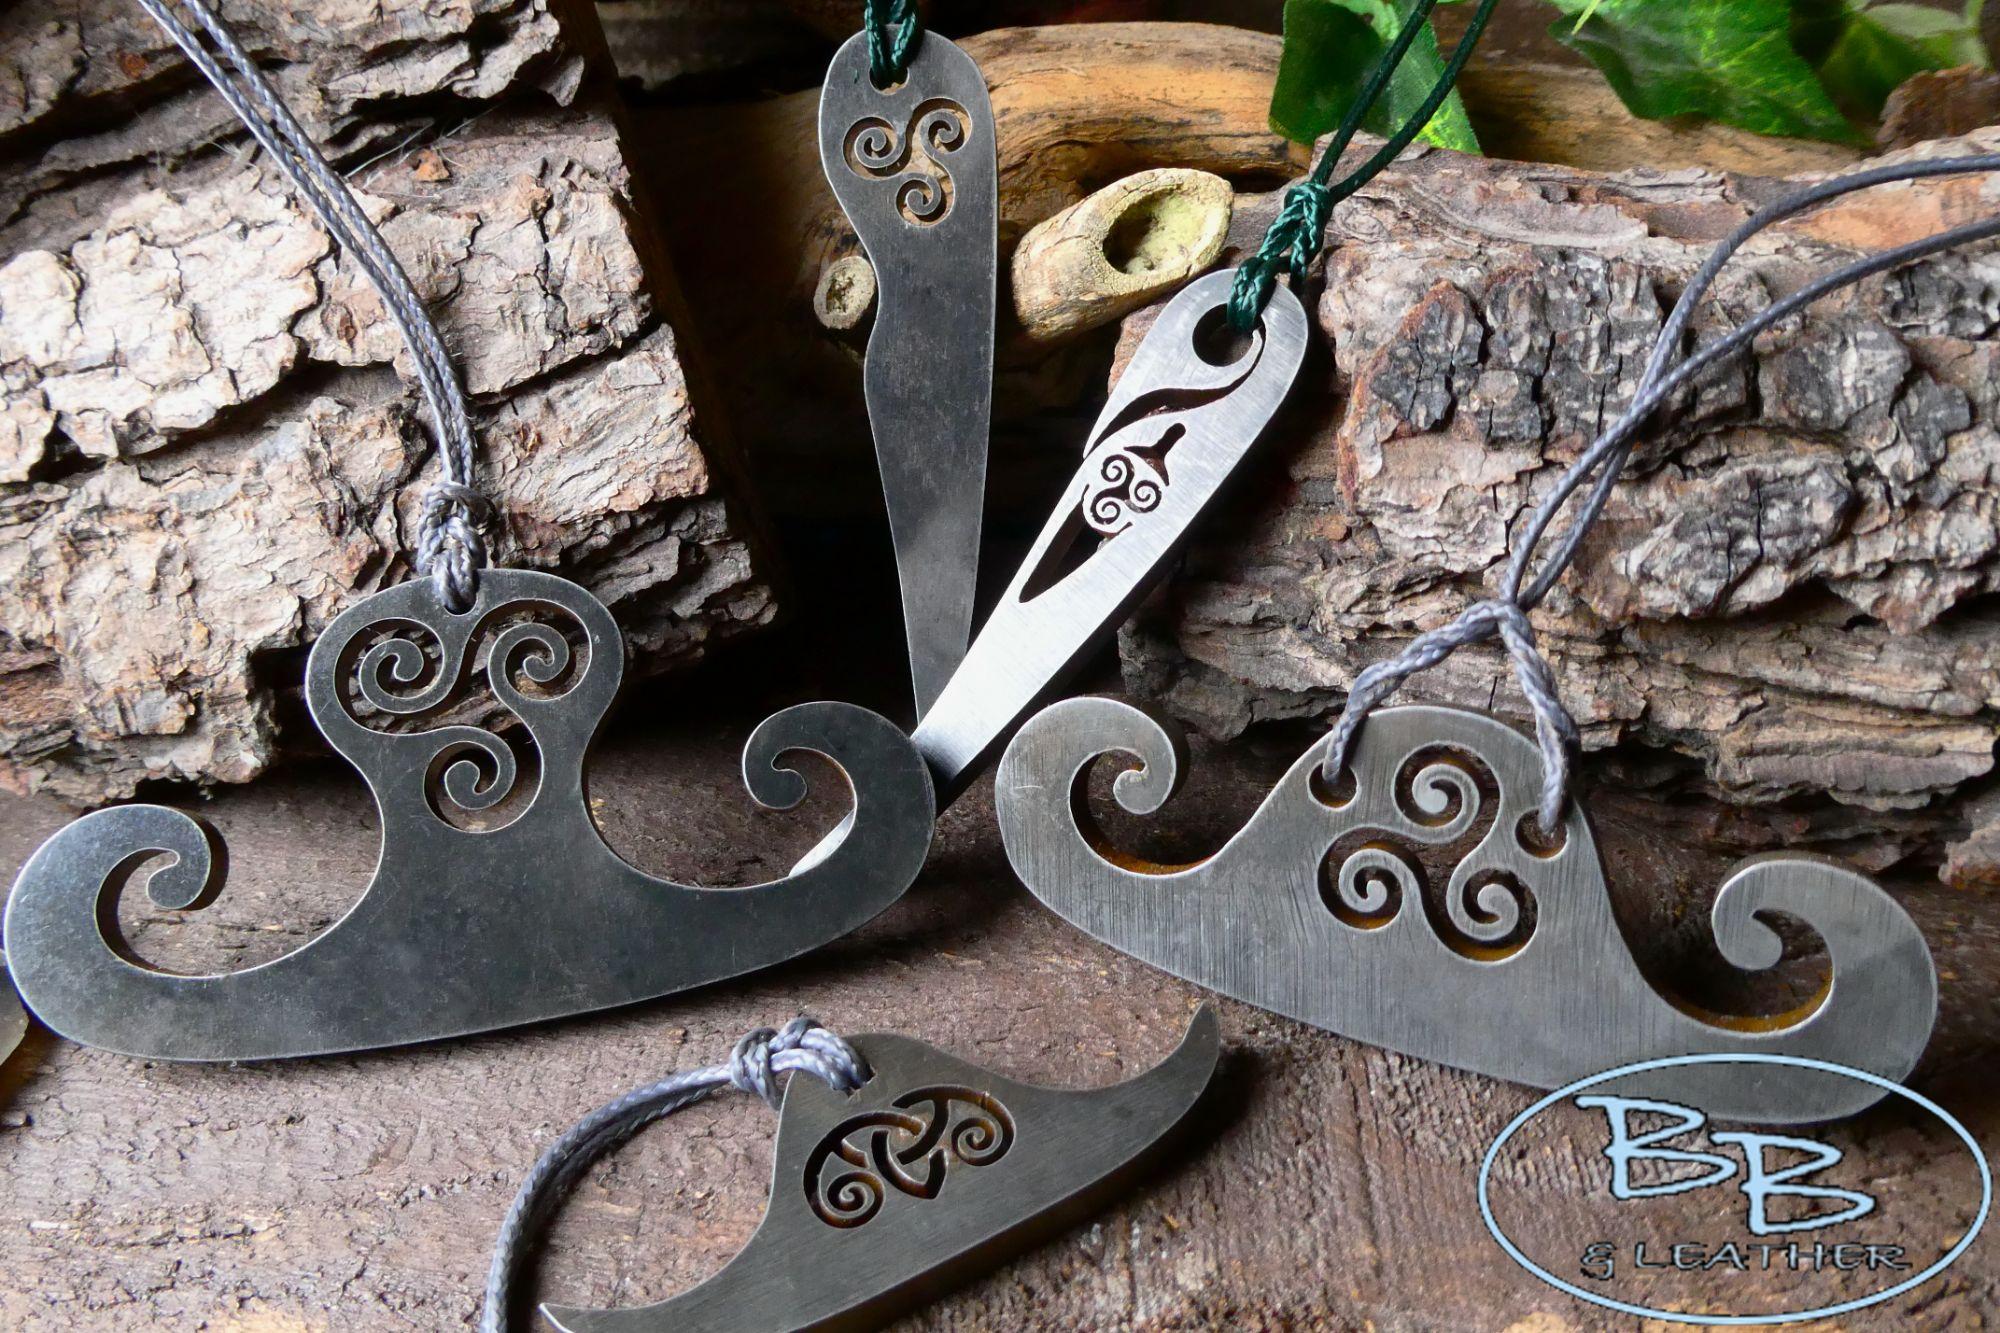 Main fire steel pick viking style thors hammer strikers by beaver bushcraft